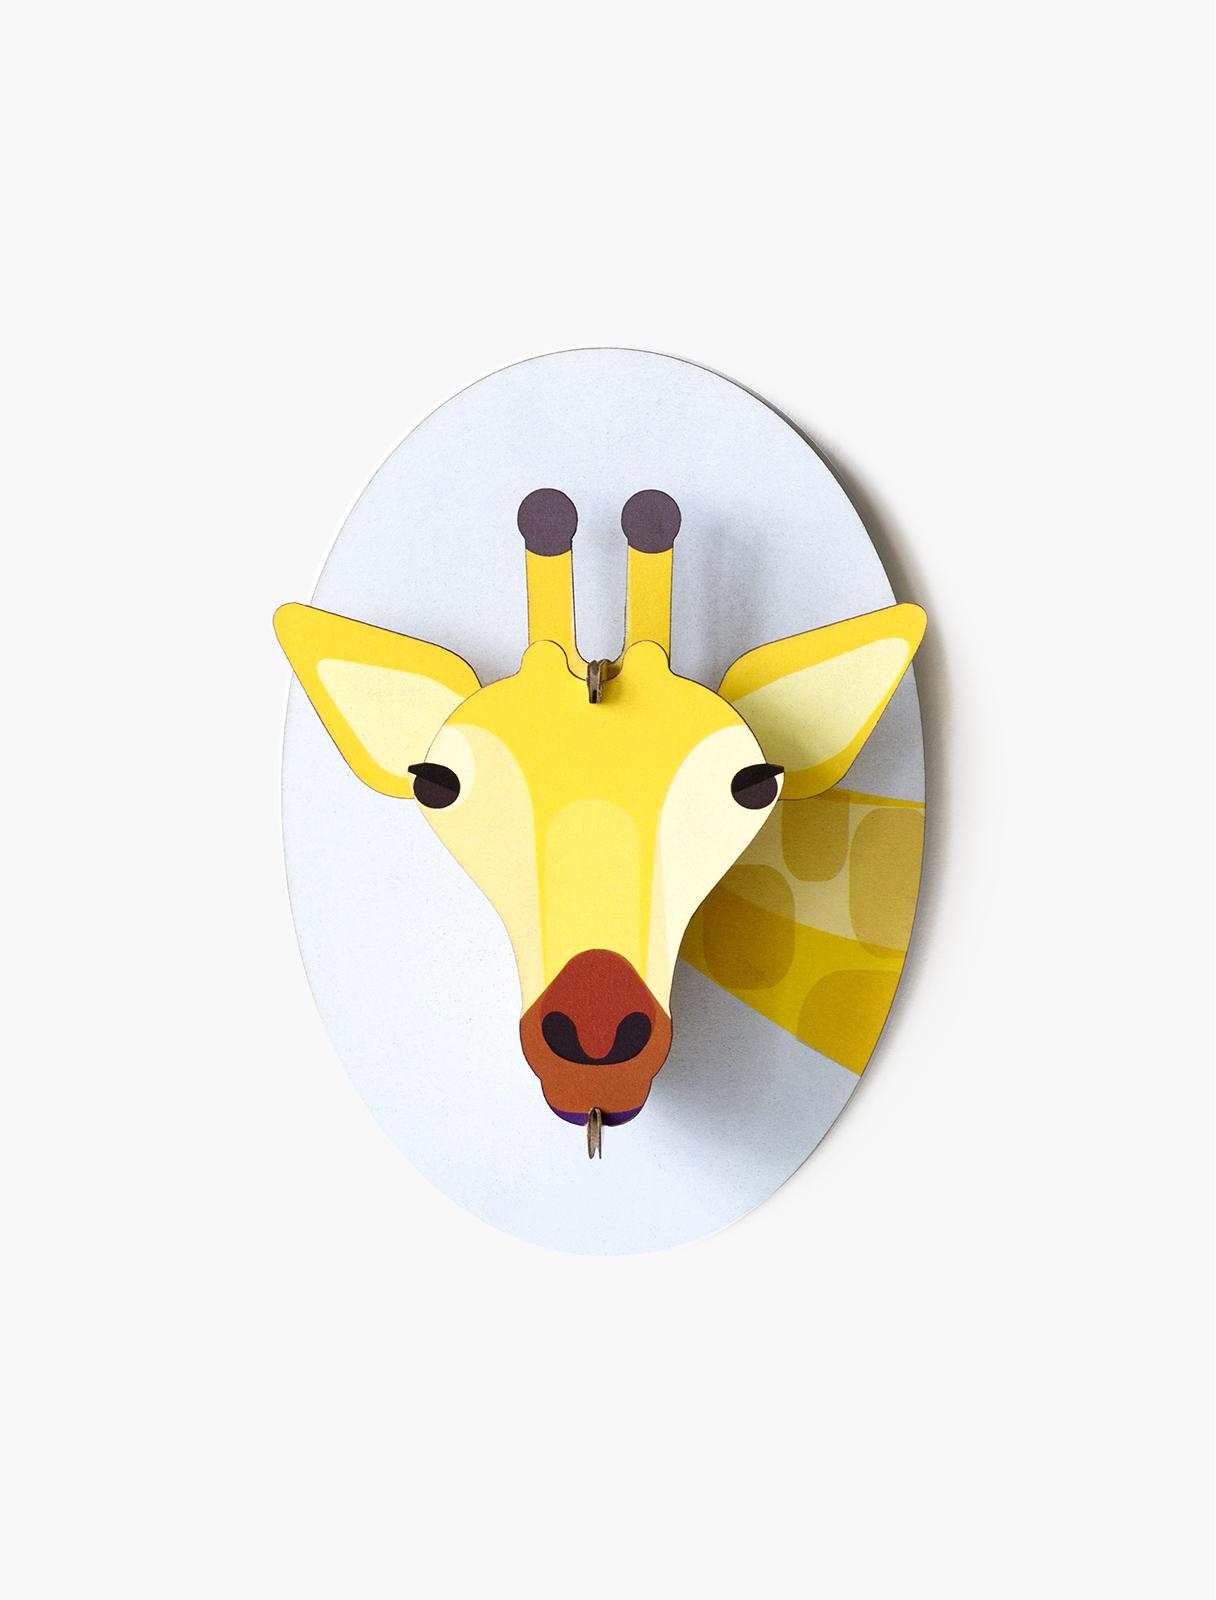 Décoration murale girafe